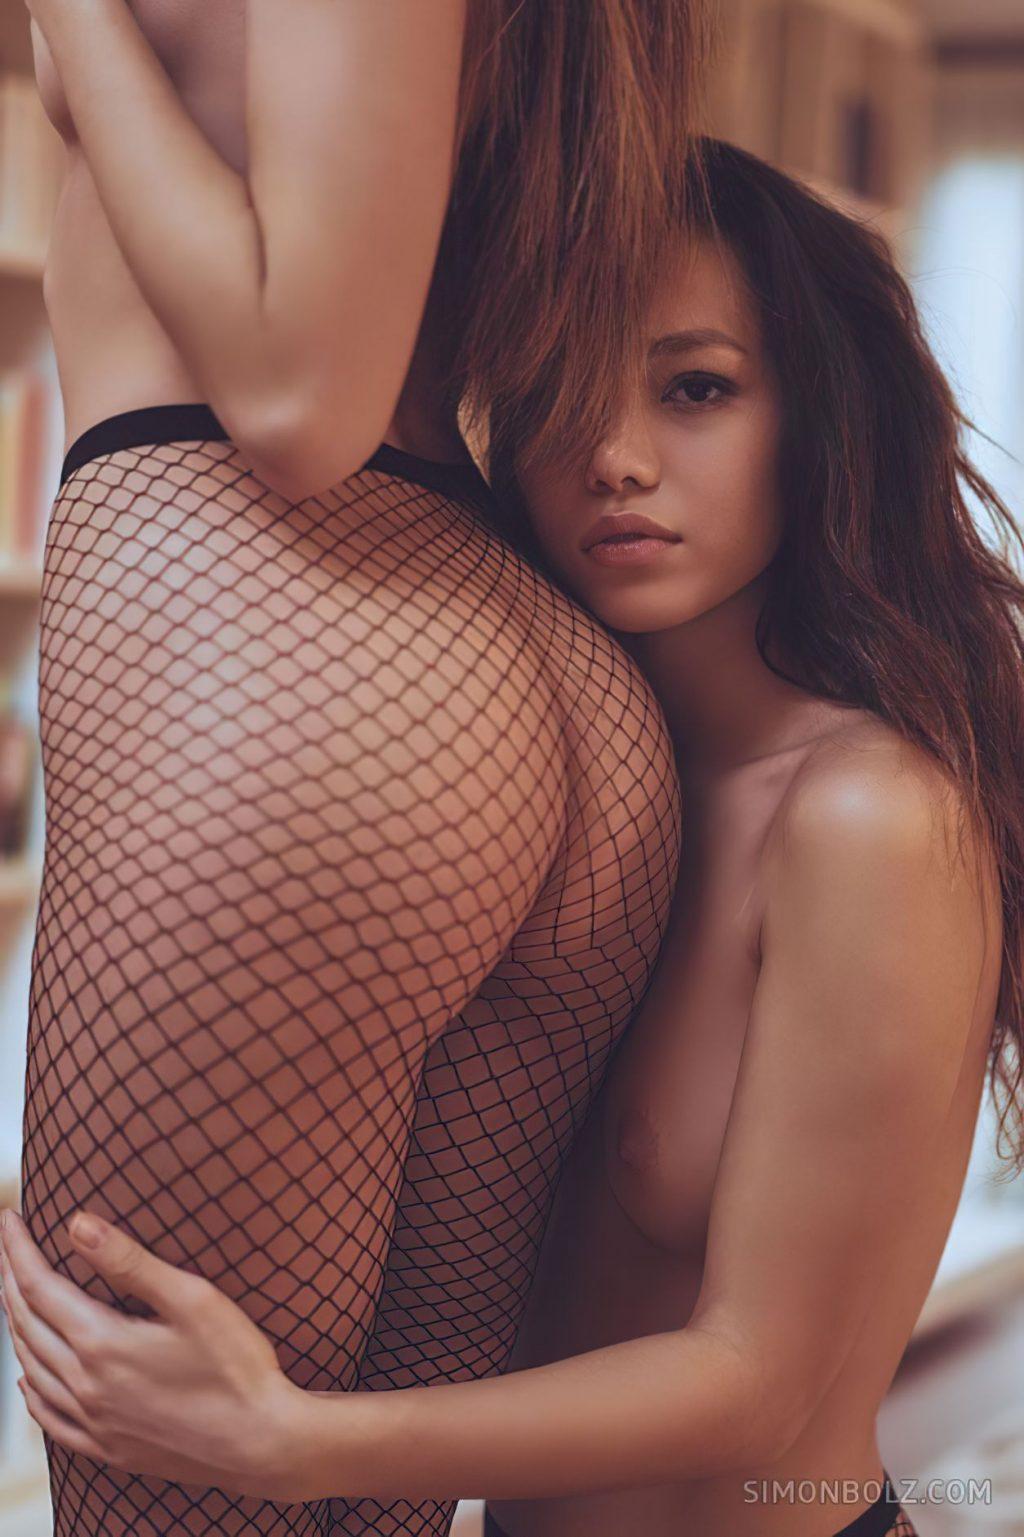 Kitrysha & Chiara Bianchino Nude (15 Photos)